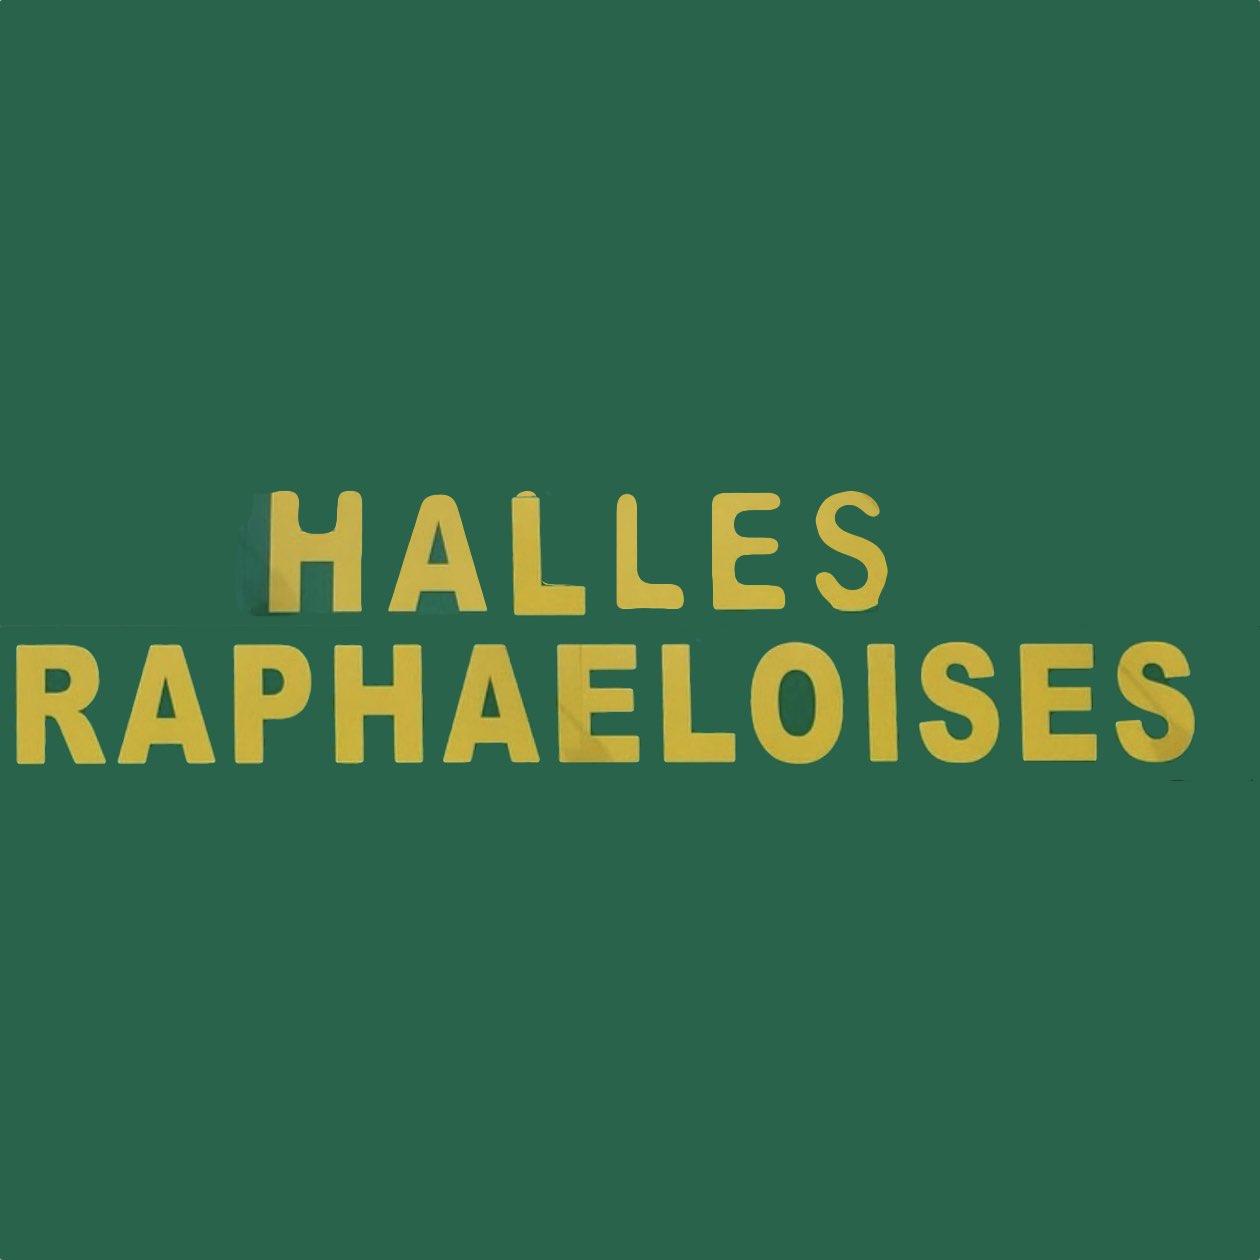 Halles Raphaeloises